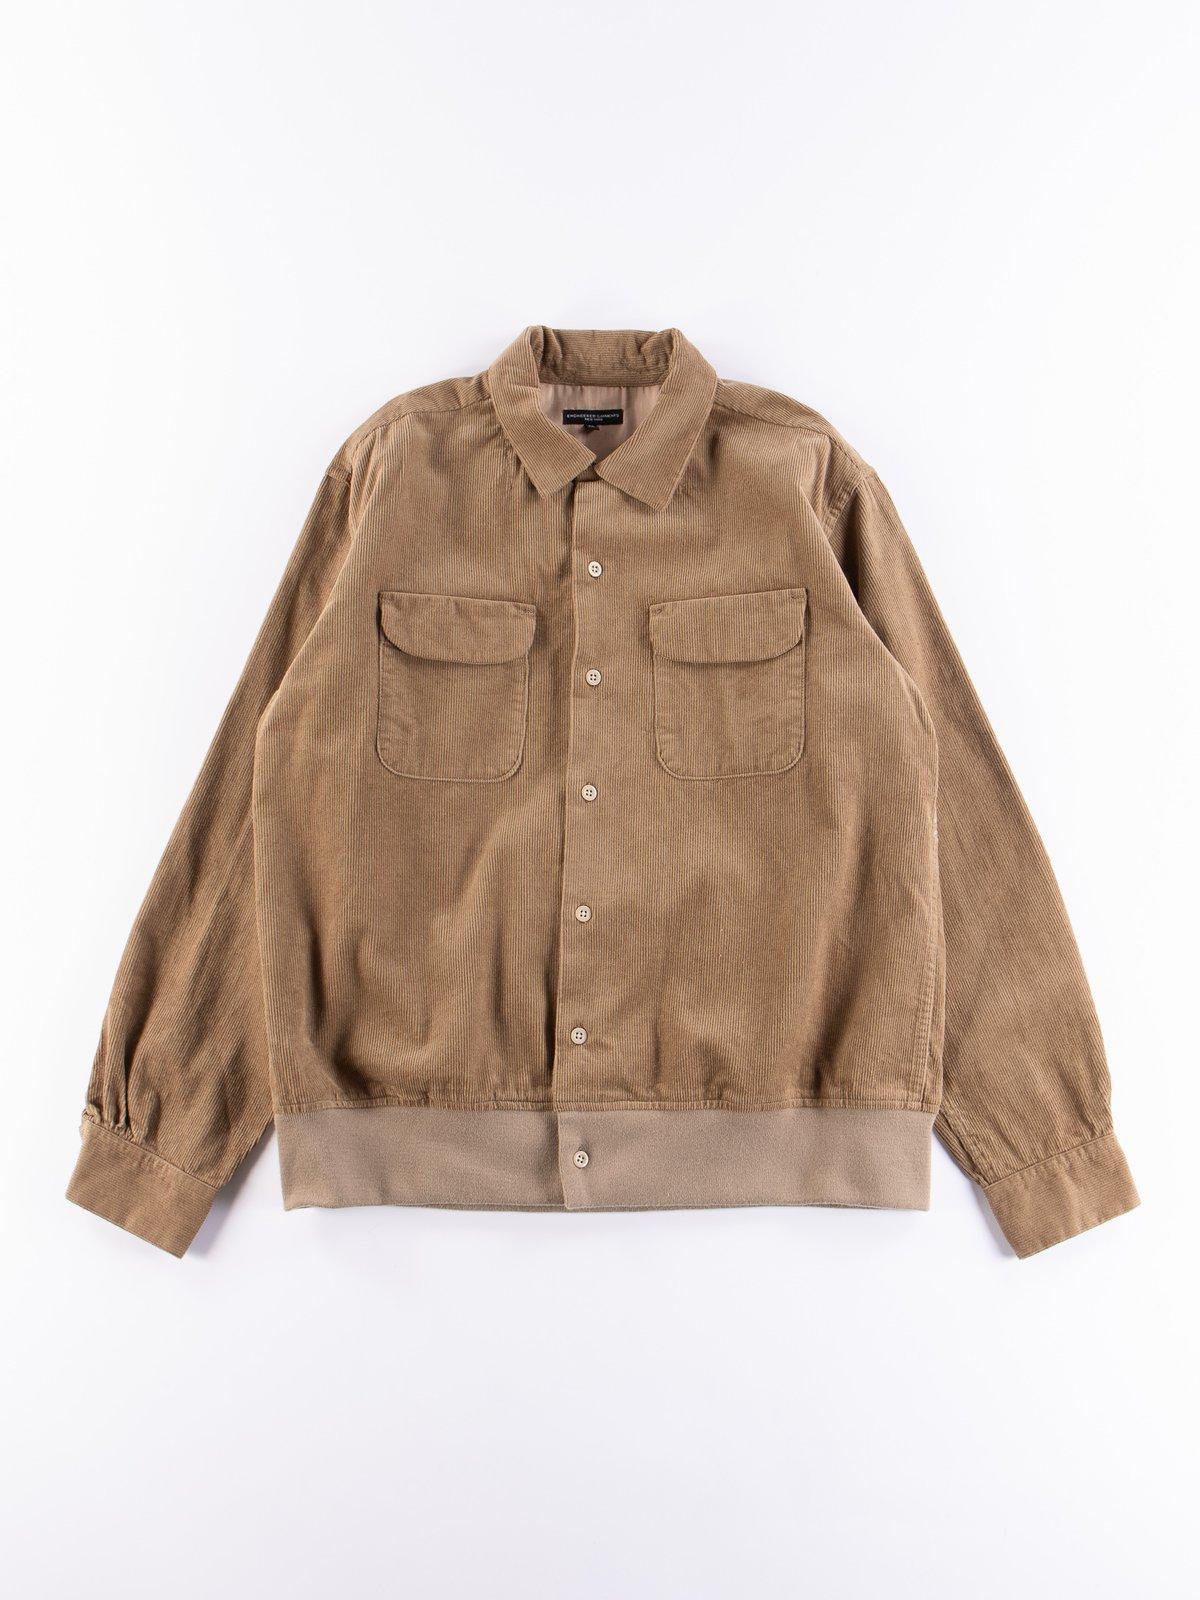 Khaki 14W Corduroy Classic Shirt - Image 1